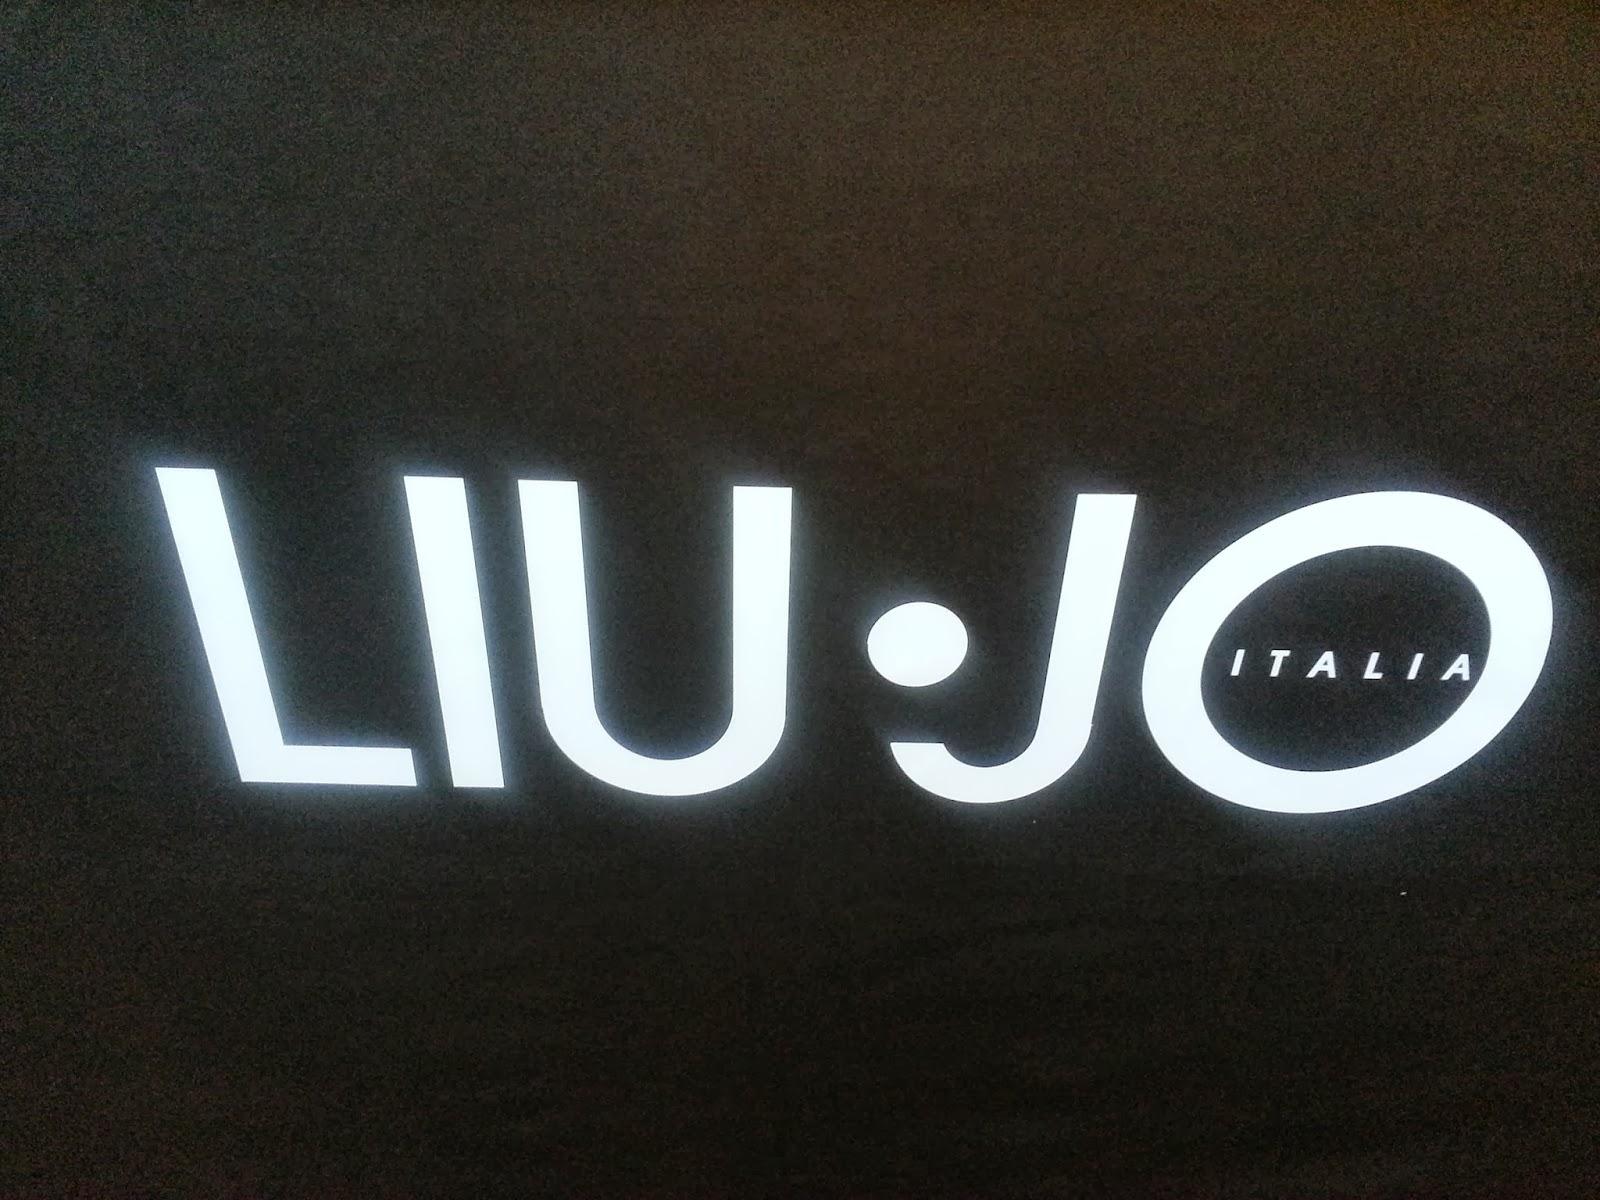 75bd317cd A loja apresenta as principais linhas da Liu Jo Collection, Liu Jo Jeans,  Liu Jo Accessories, Liu Jo Shoes, Liu Jo Underwear e Beachwear.